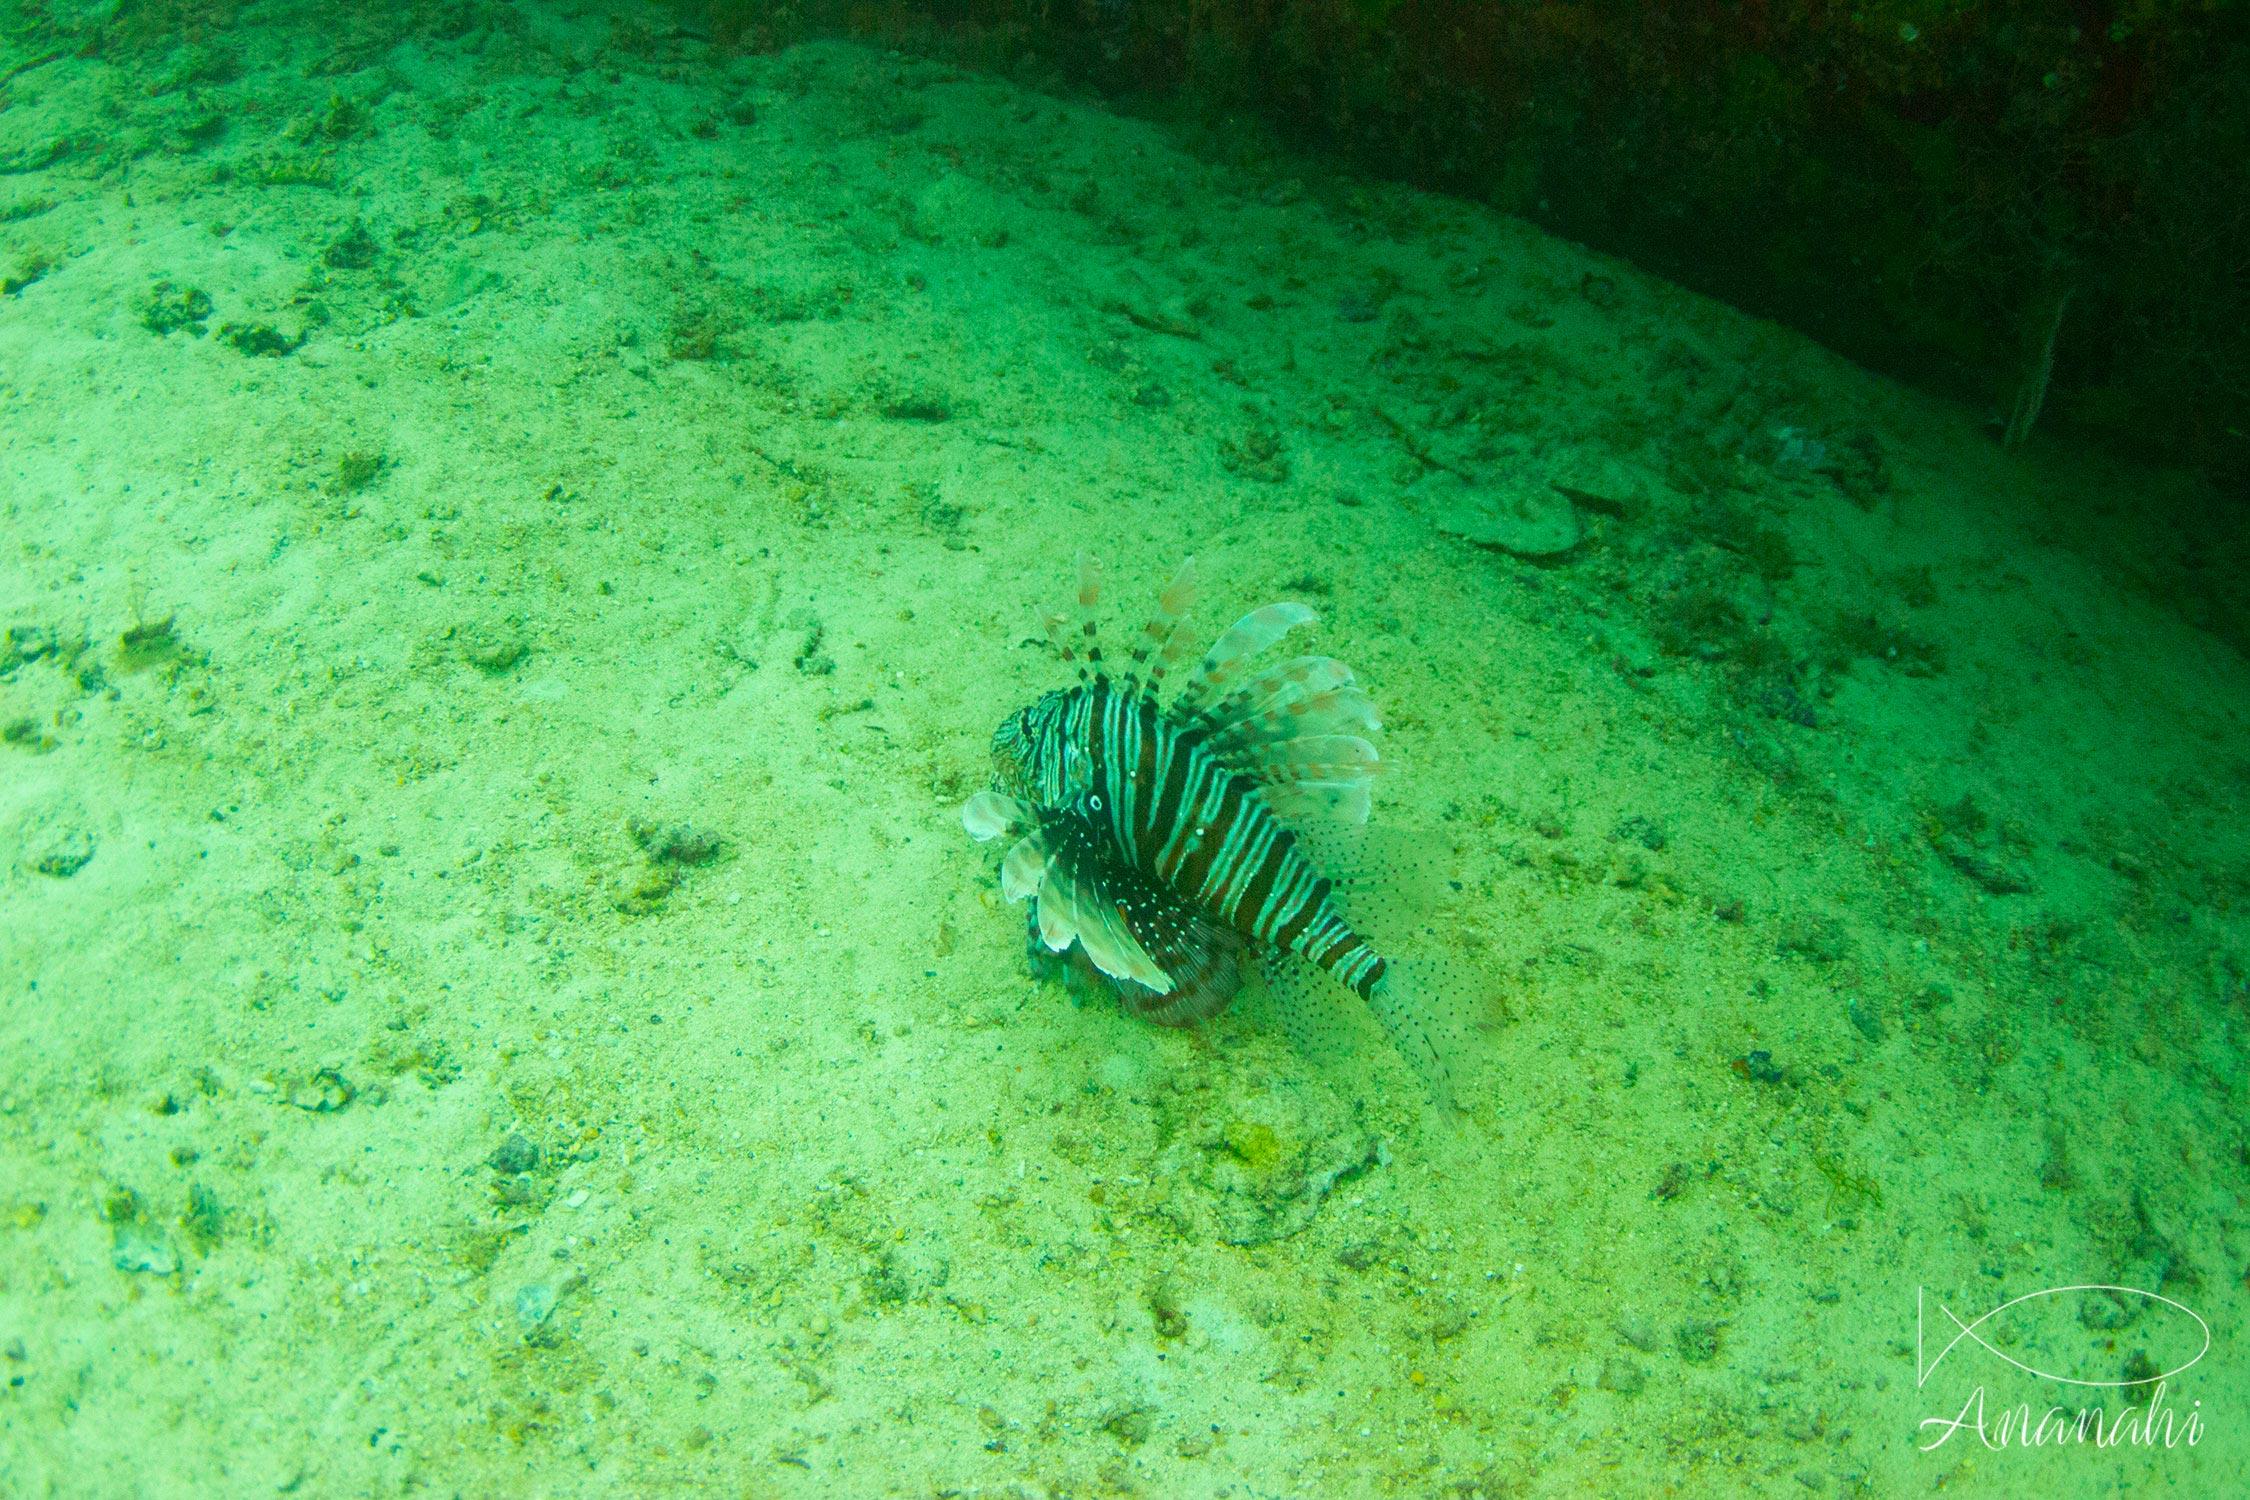 Common lionfish of Maldives